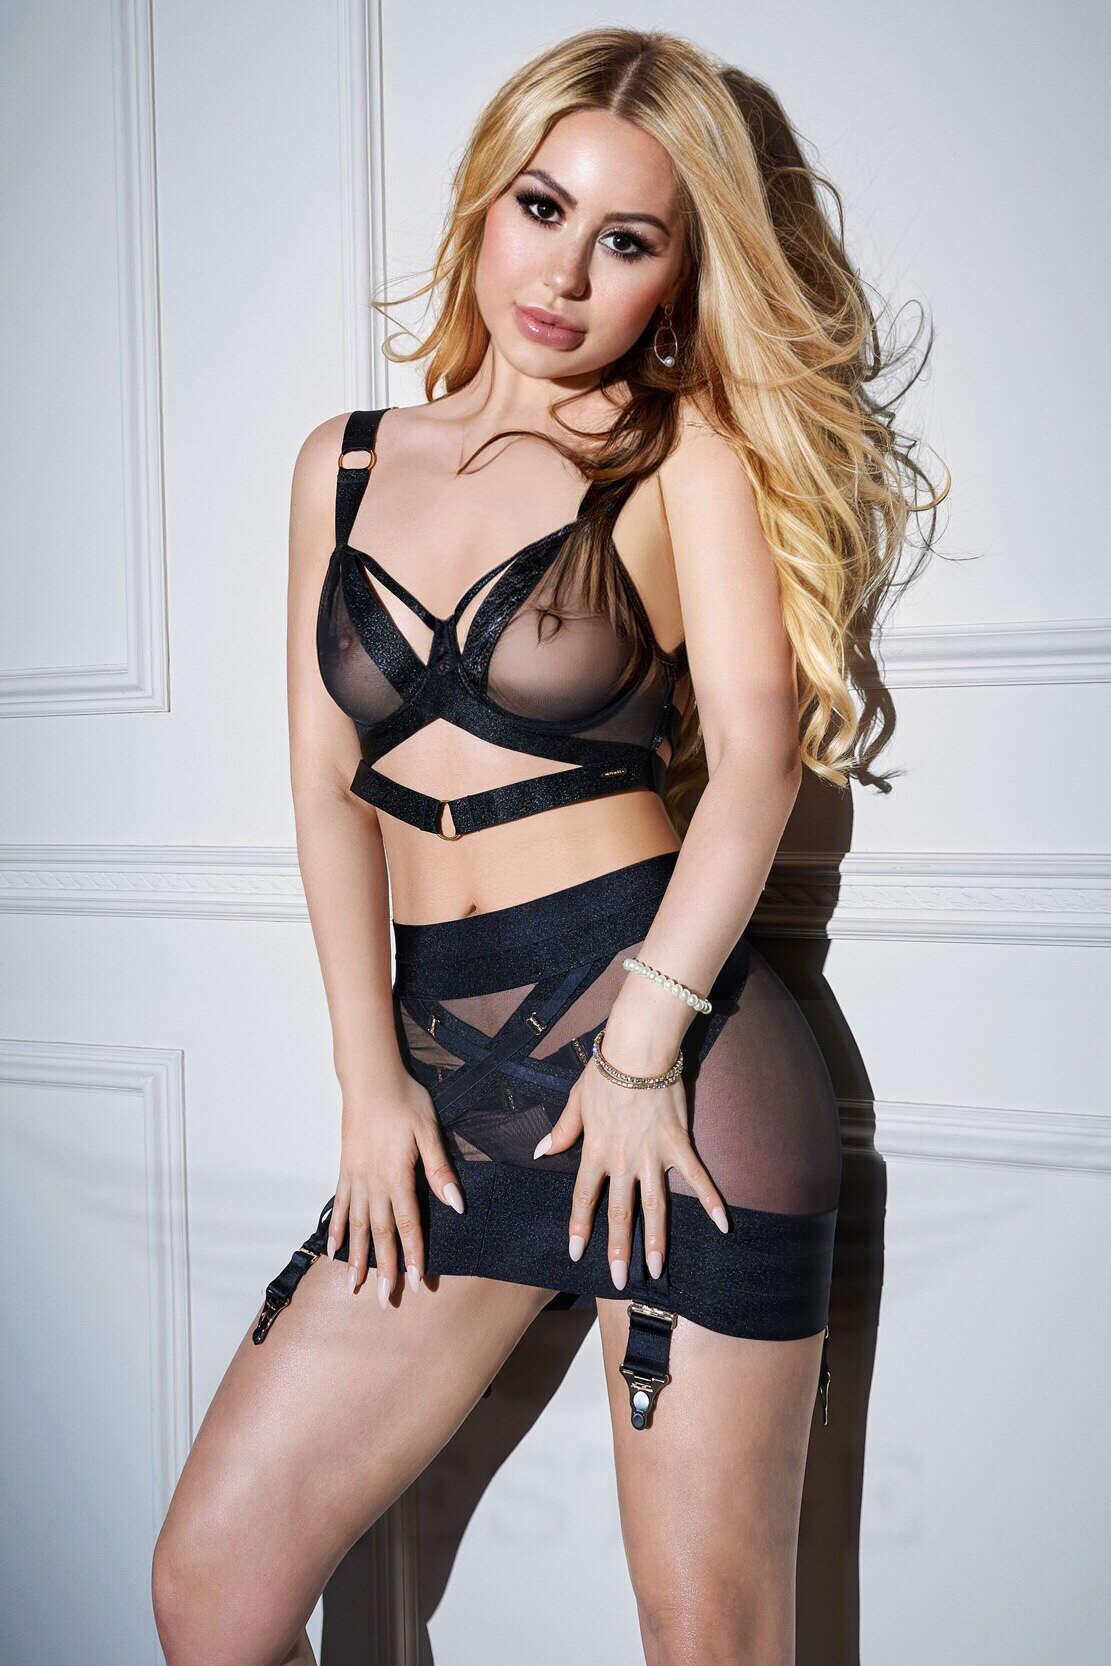 Dominika from Prestige London Escorts